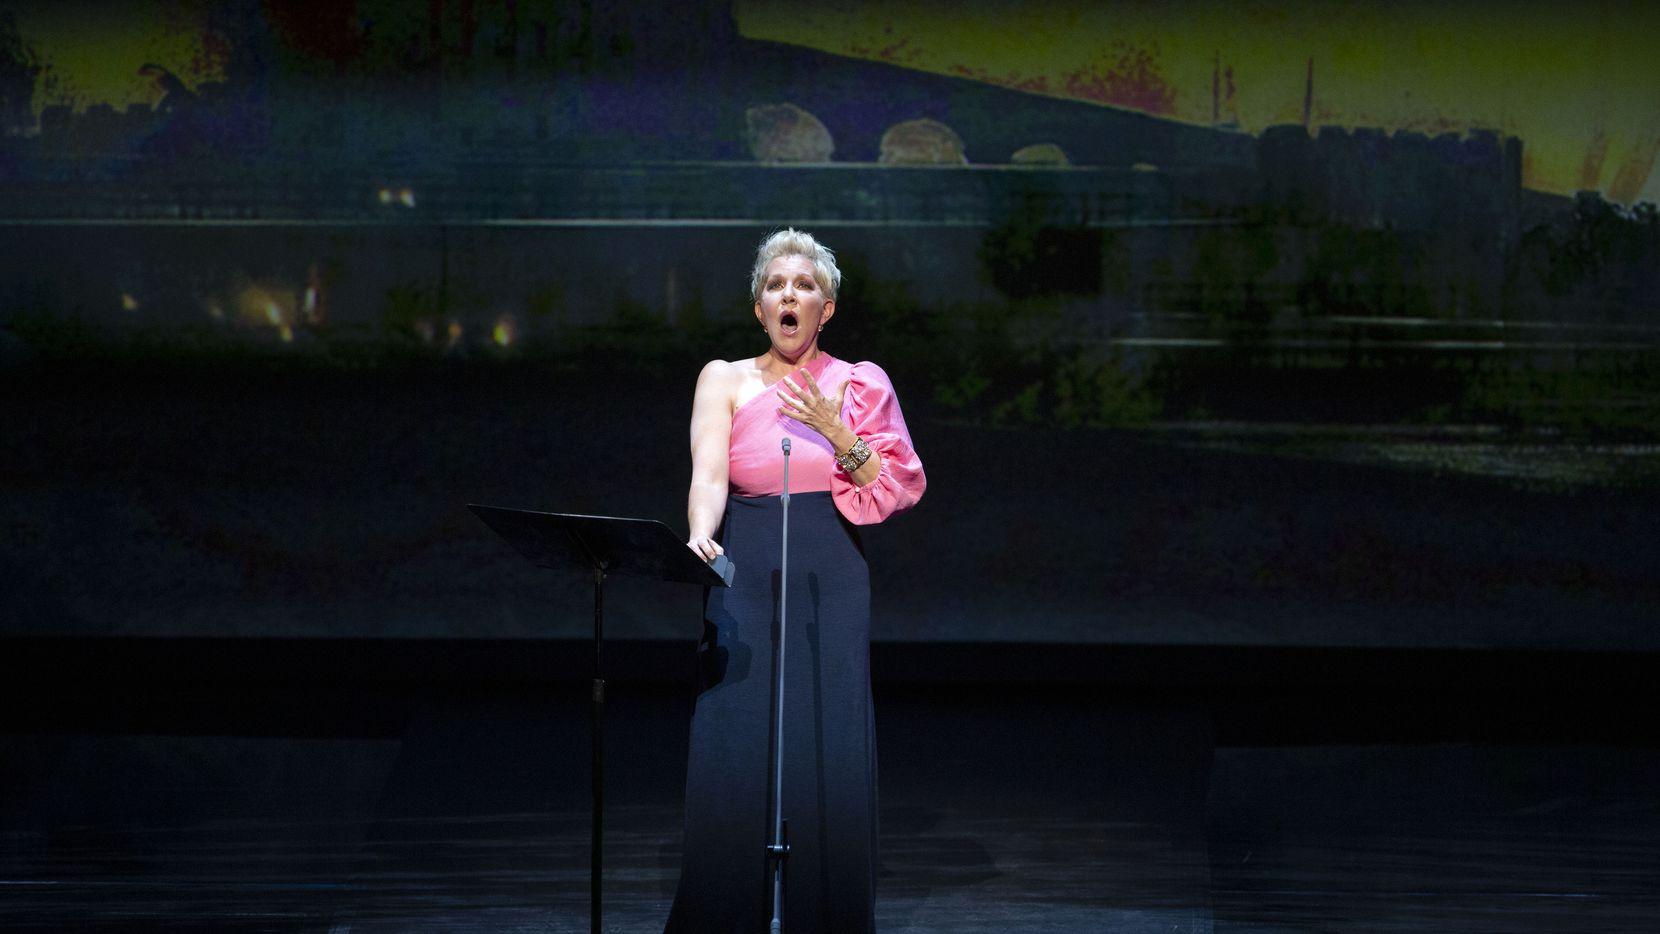 Mezzo-soprano Joyce DiDonato joins conductor Emmanuel Villaume and the Dallas Opera Orchestra at the Winspear Opera House in Dallas, Texas on May 10, 2021.